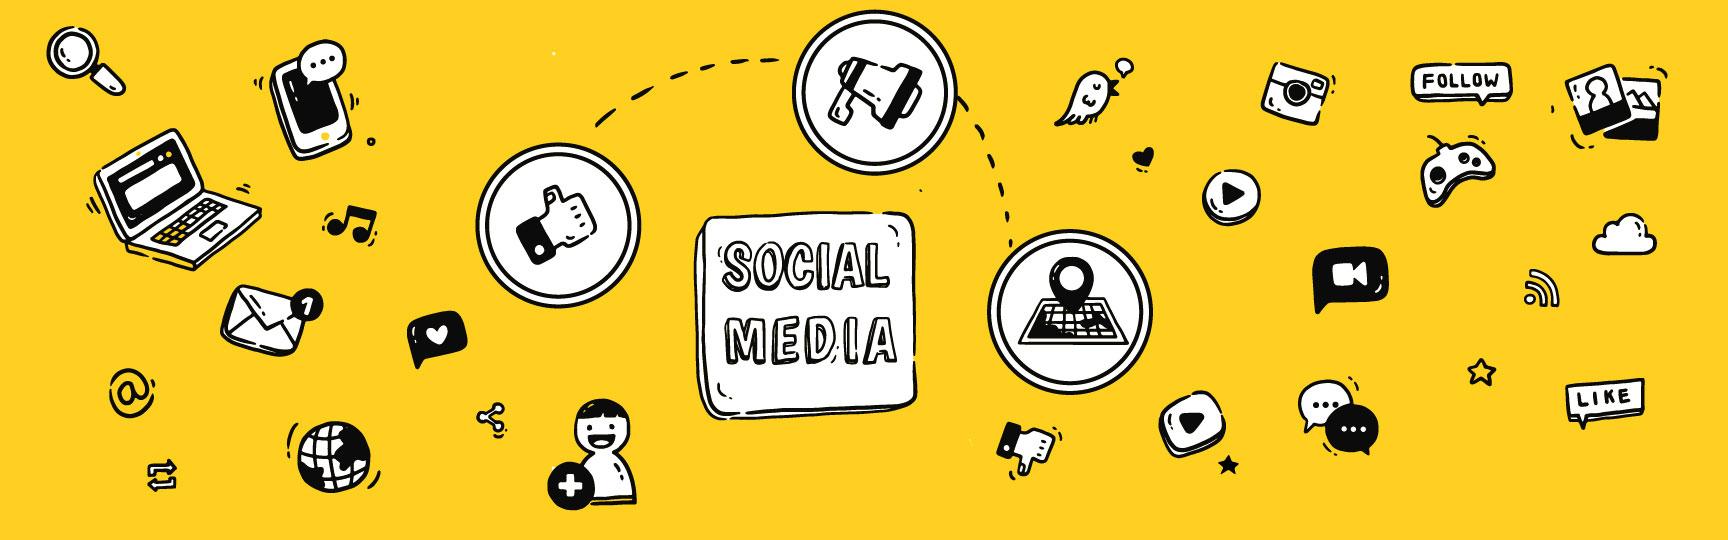 10 Way To Increase Social Engagement